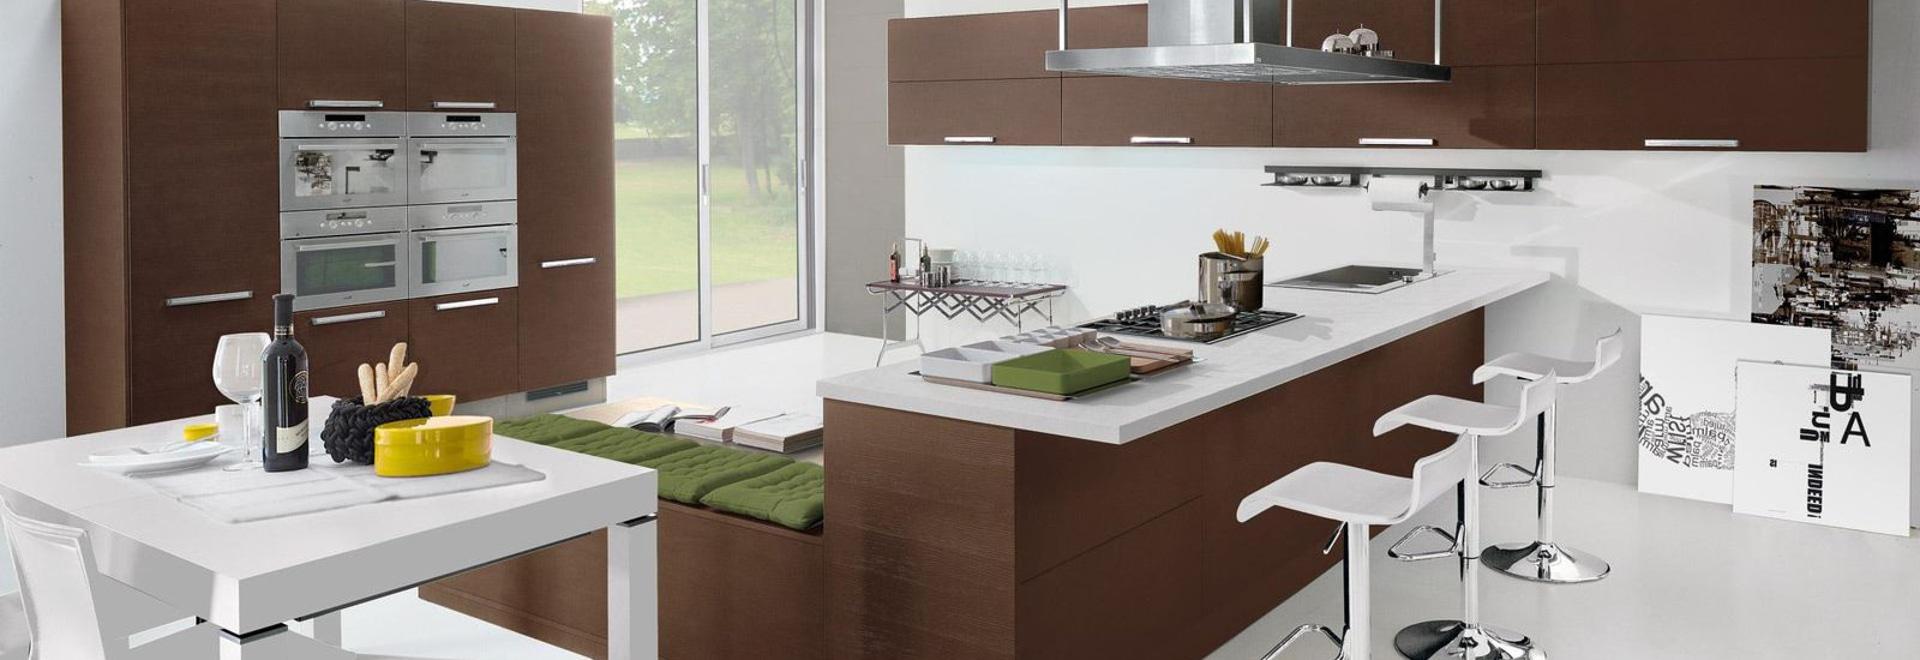 NEW: contemporary kitchen by CUCINE LUBE - CUCINE LUBE